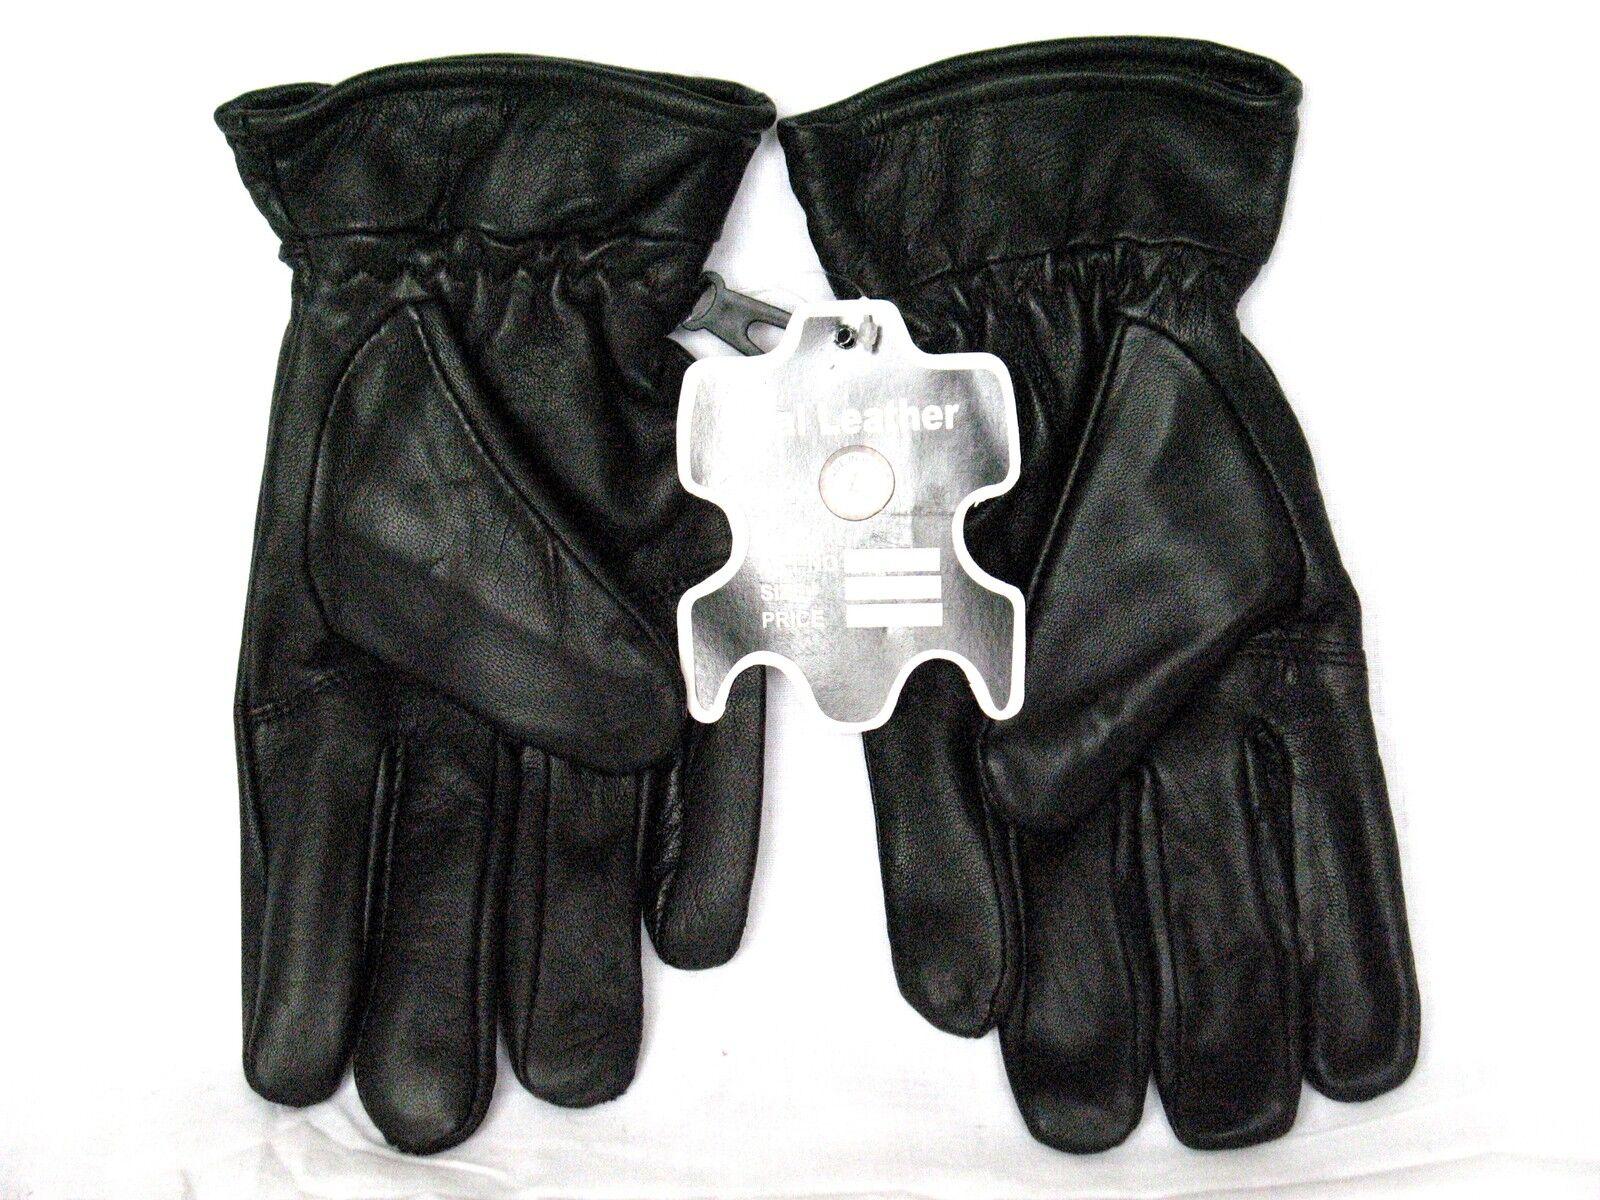 Black 100% Genuine Leather Gloves Medium L XL XXL XXXL 4XL Winter Dress Gloves